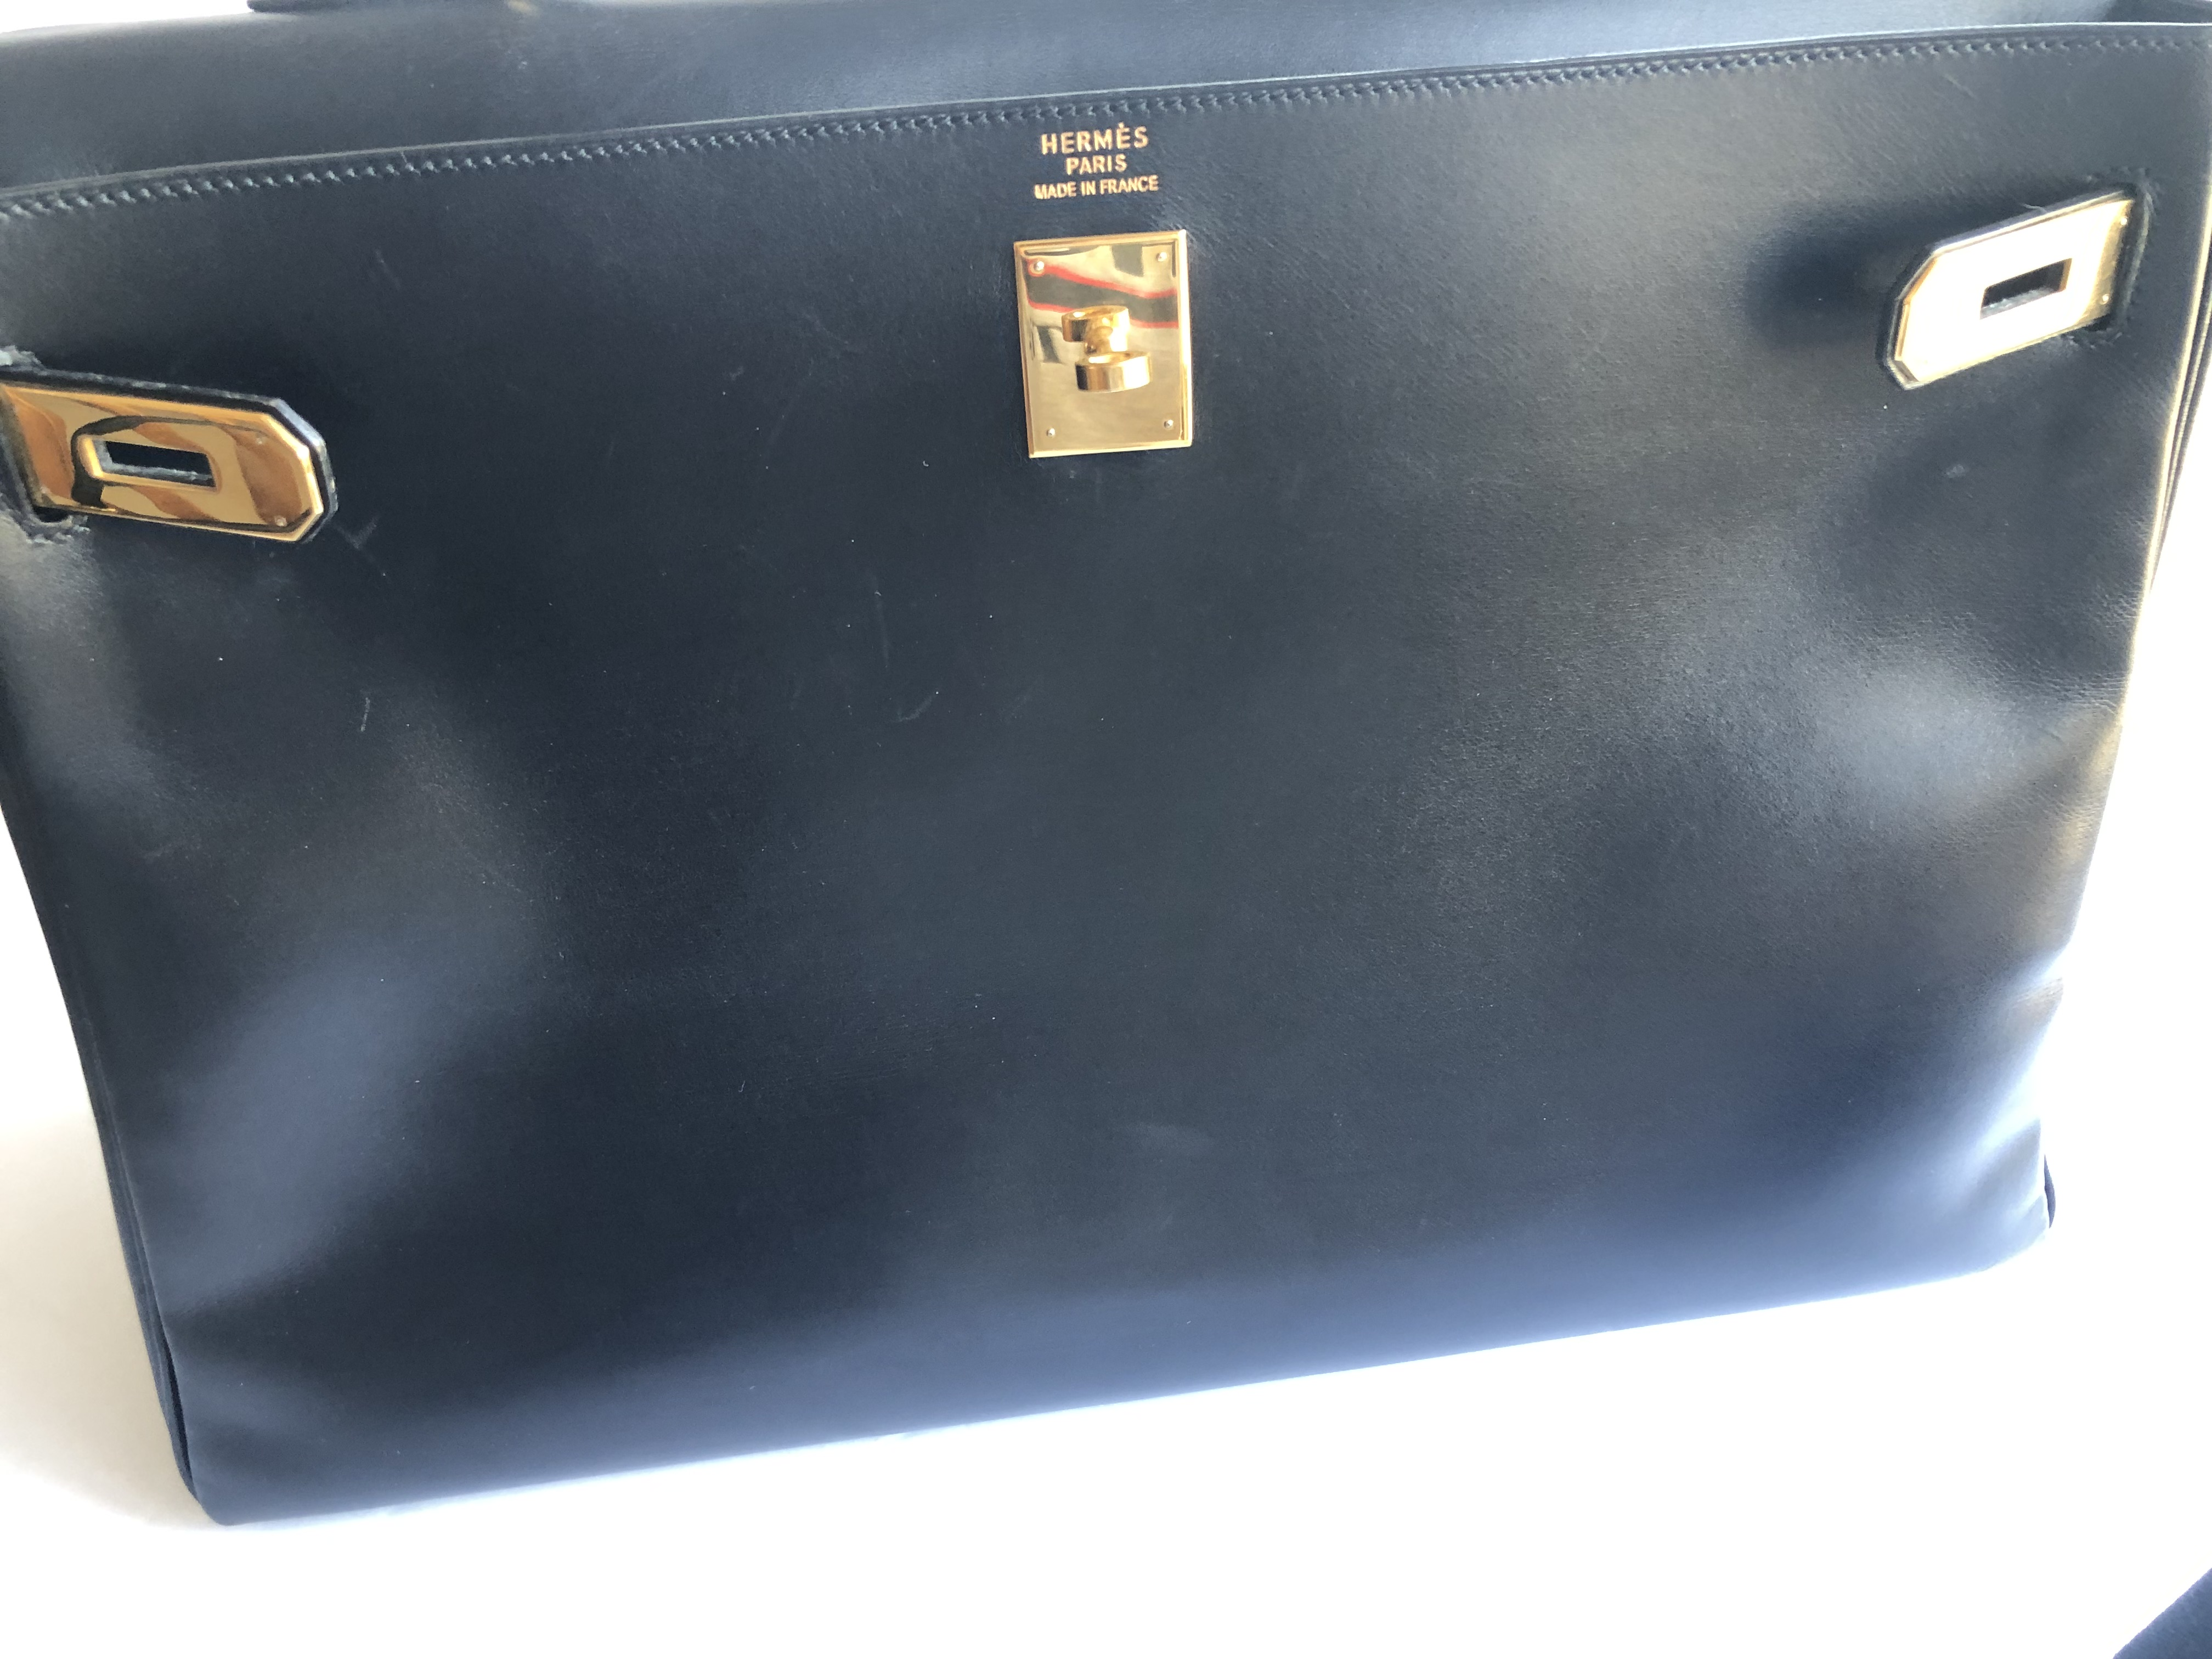 cddeef2fdf Authentic HERMES Kelly 40 cm Black Noir Box Calf Gold Hardware Vintage